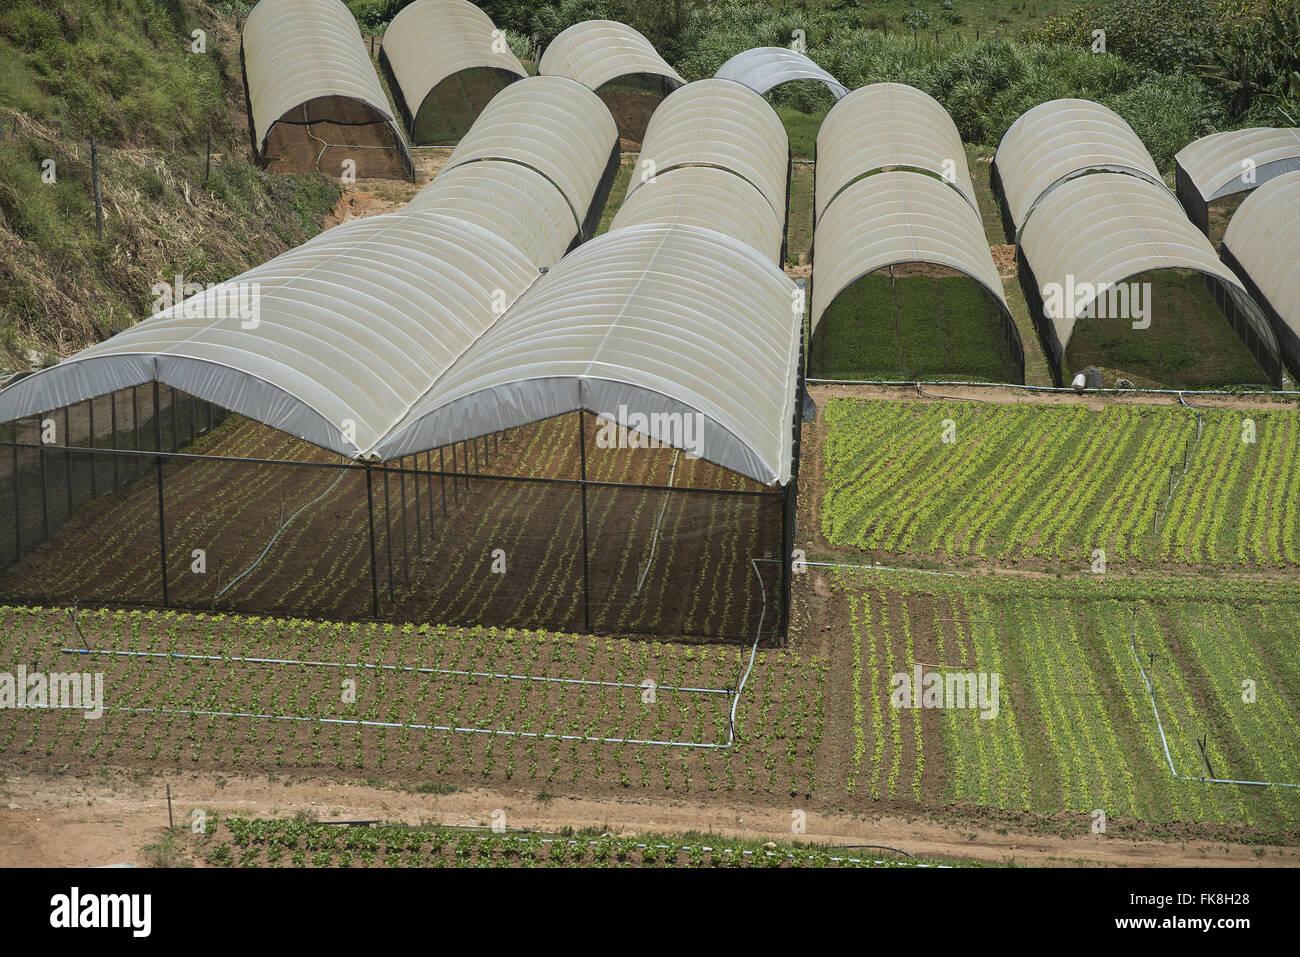 Seedling greenhouses for vegetable production in Vargem Grande neighborhood - Stock Image